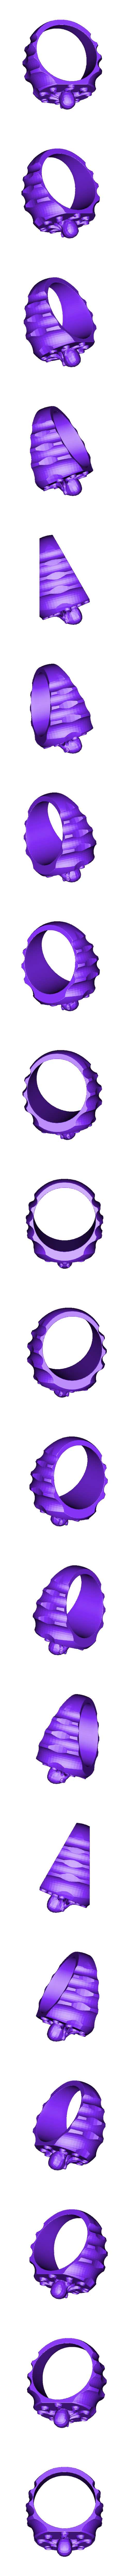 anillo.stl Download free STL file octo-ring • Template to 3D print, rauldavidpr11